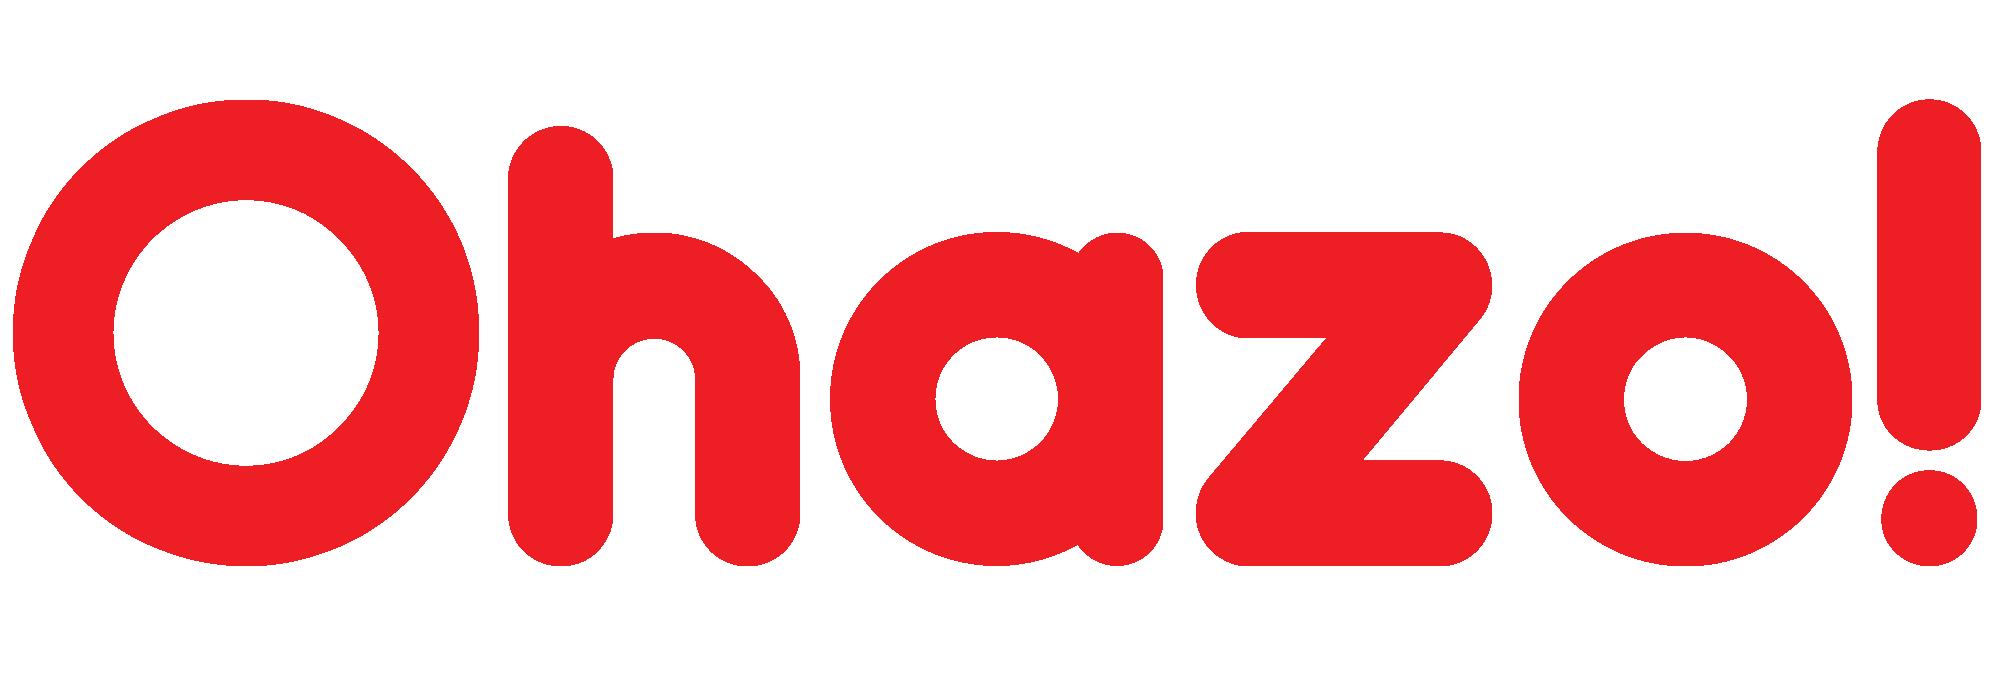 Ohazo